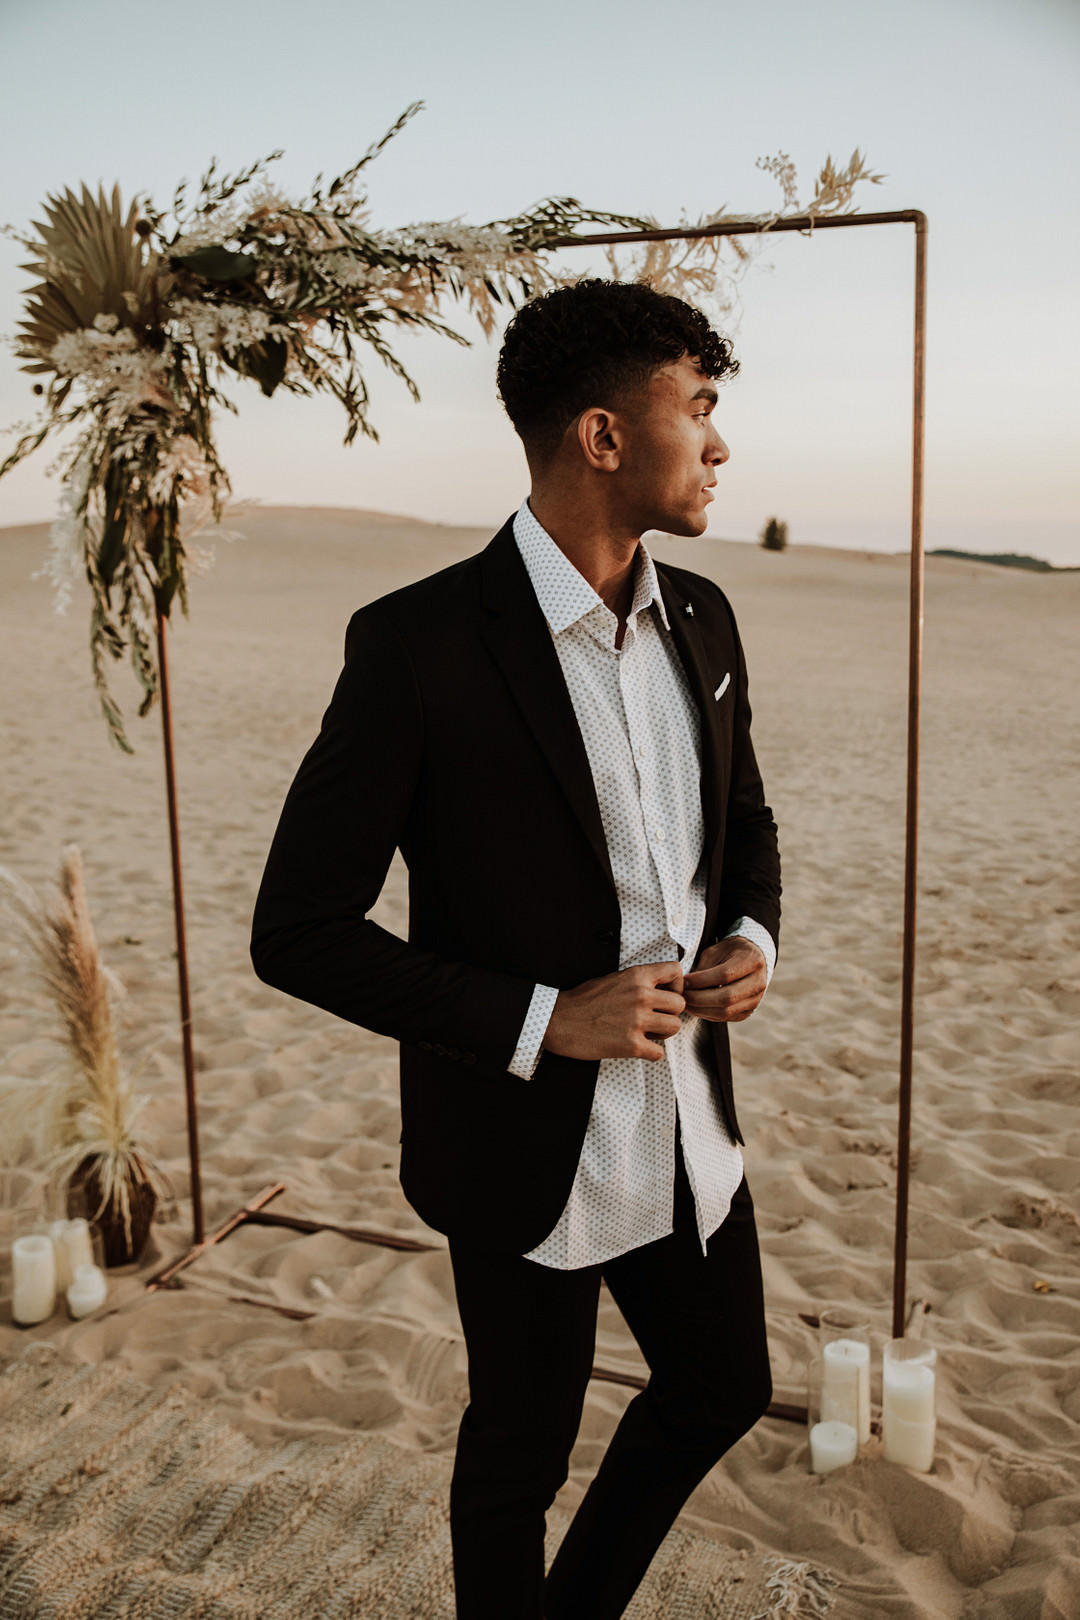 Groom Suit Open Collar Shirt Sand Dunes Wedding Photos By Gayle